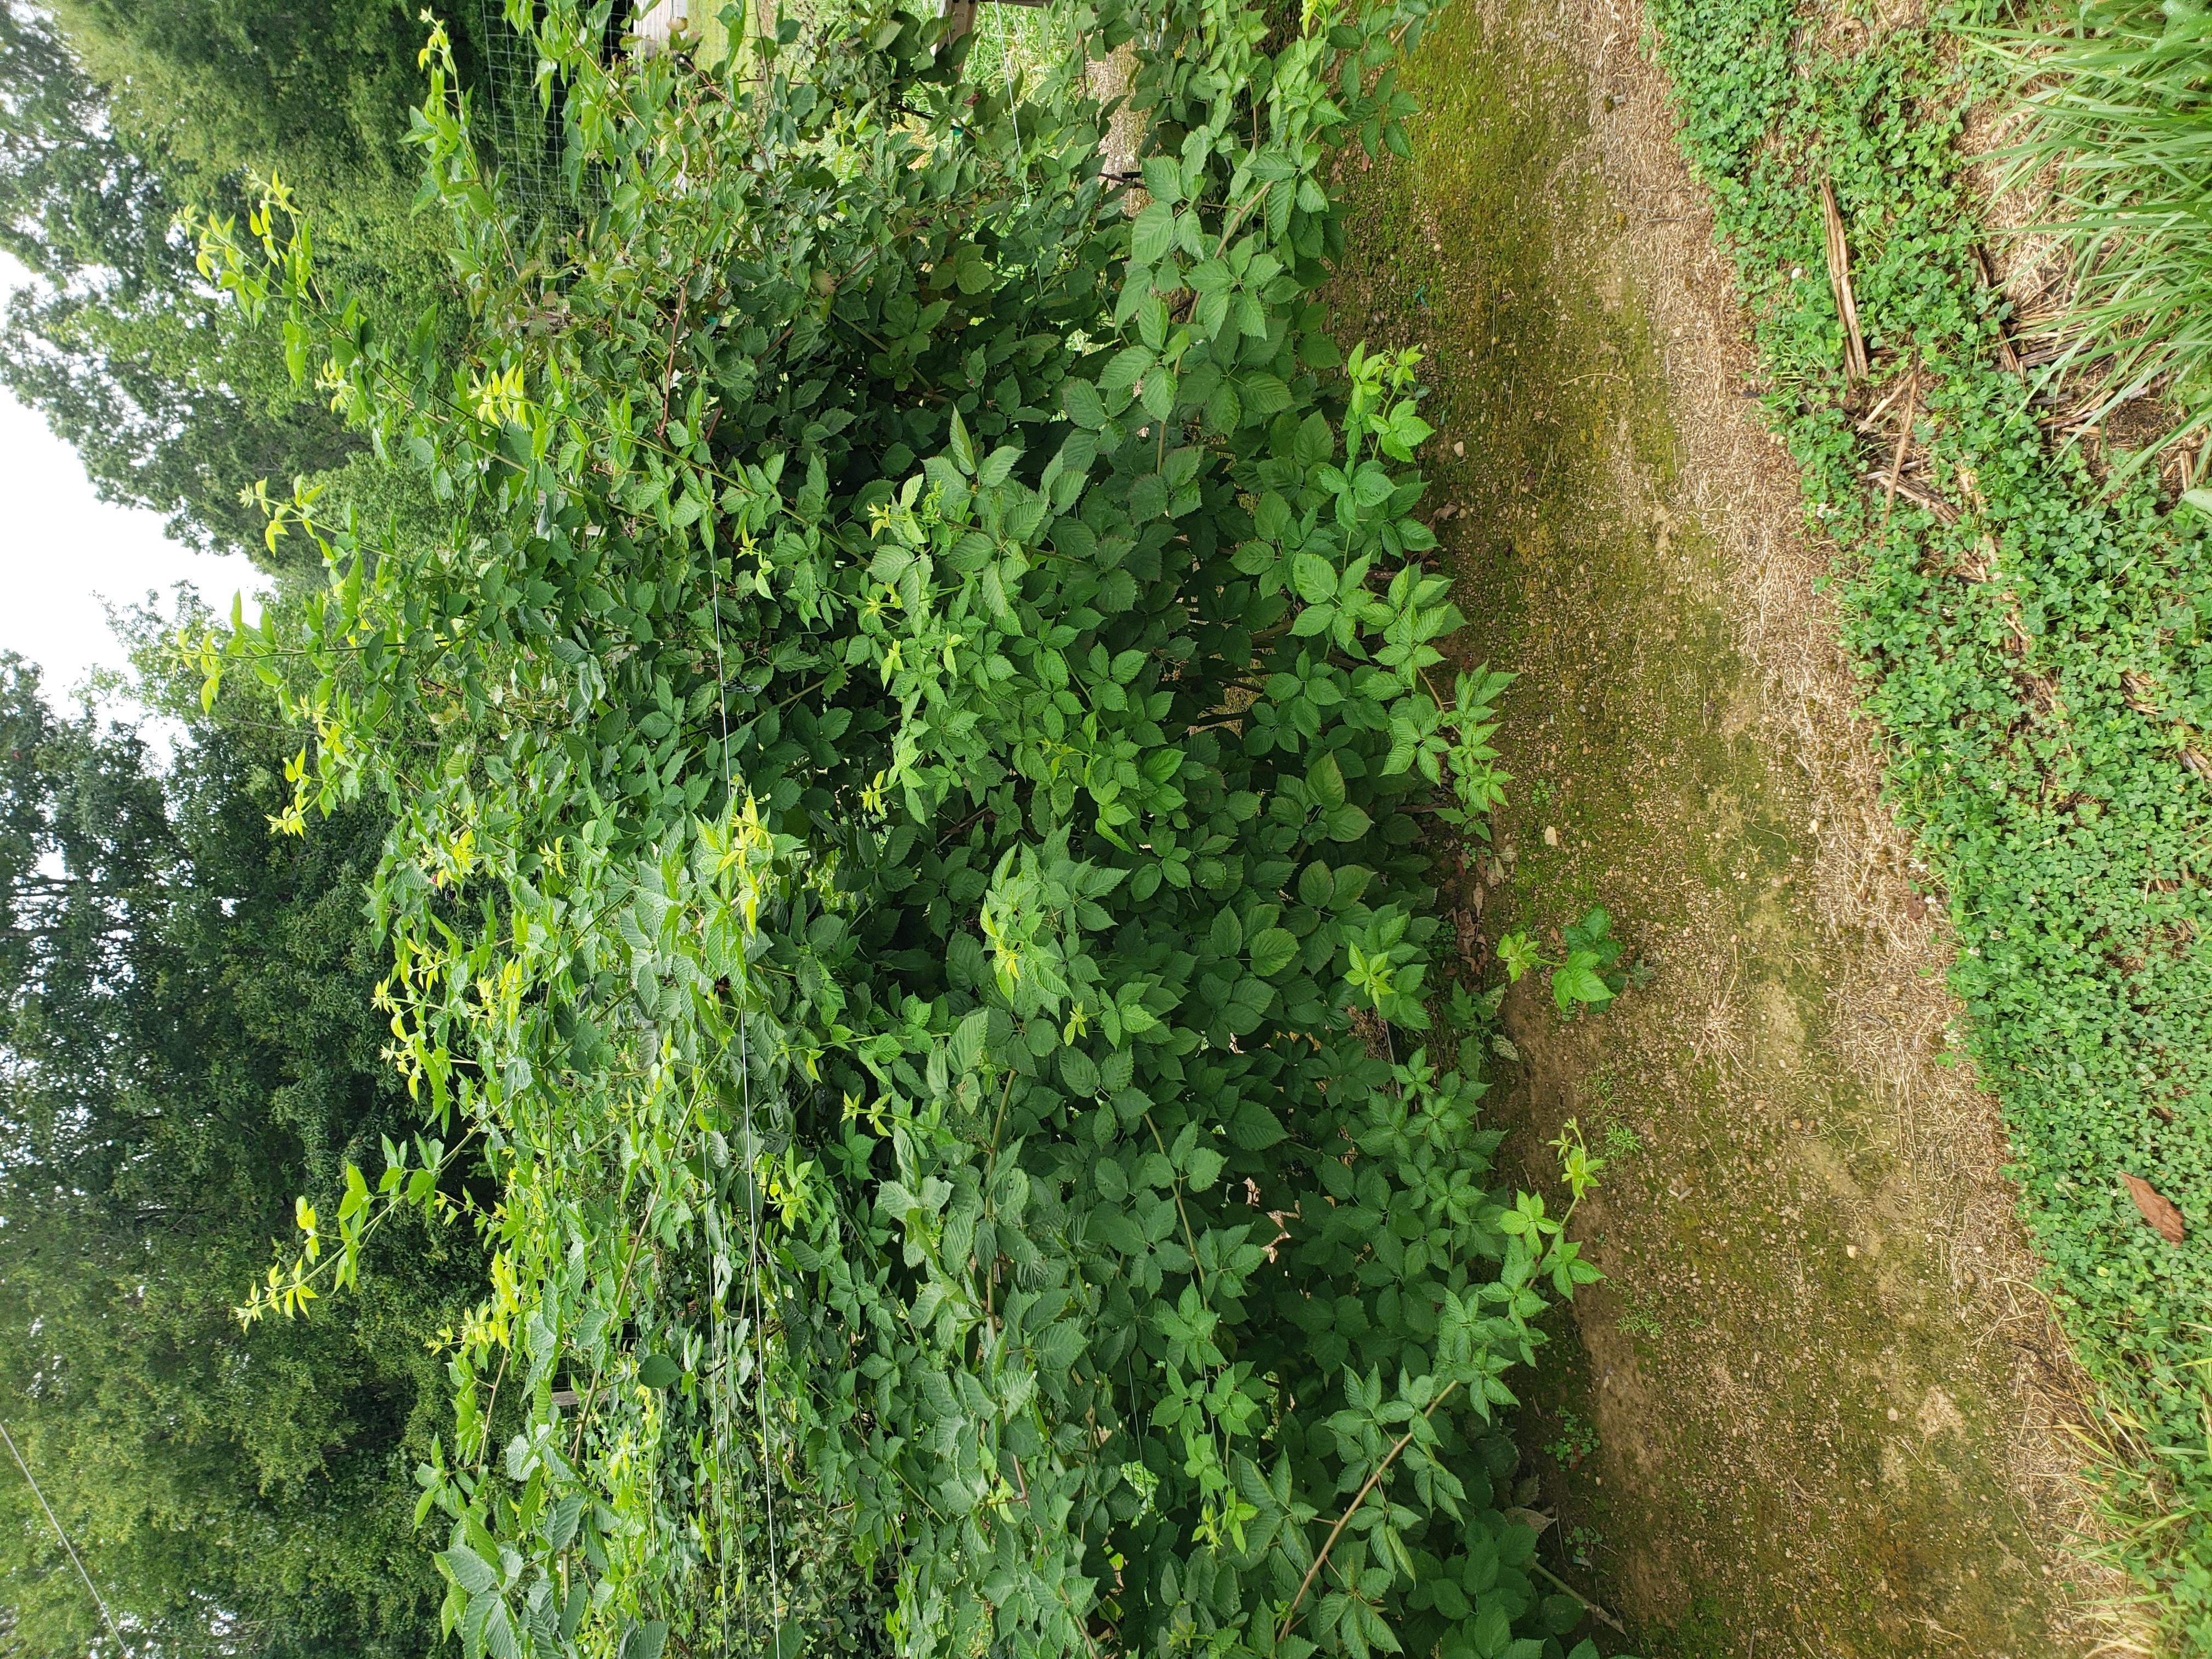 unpruned blackberry plants